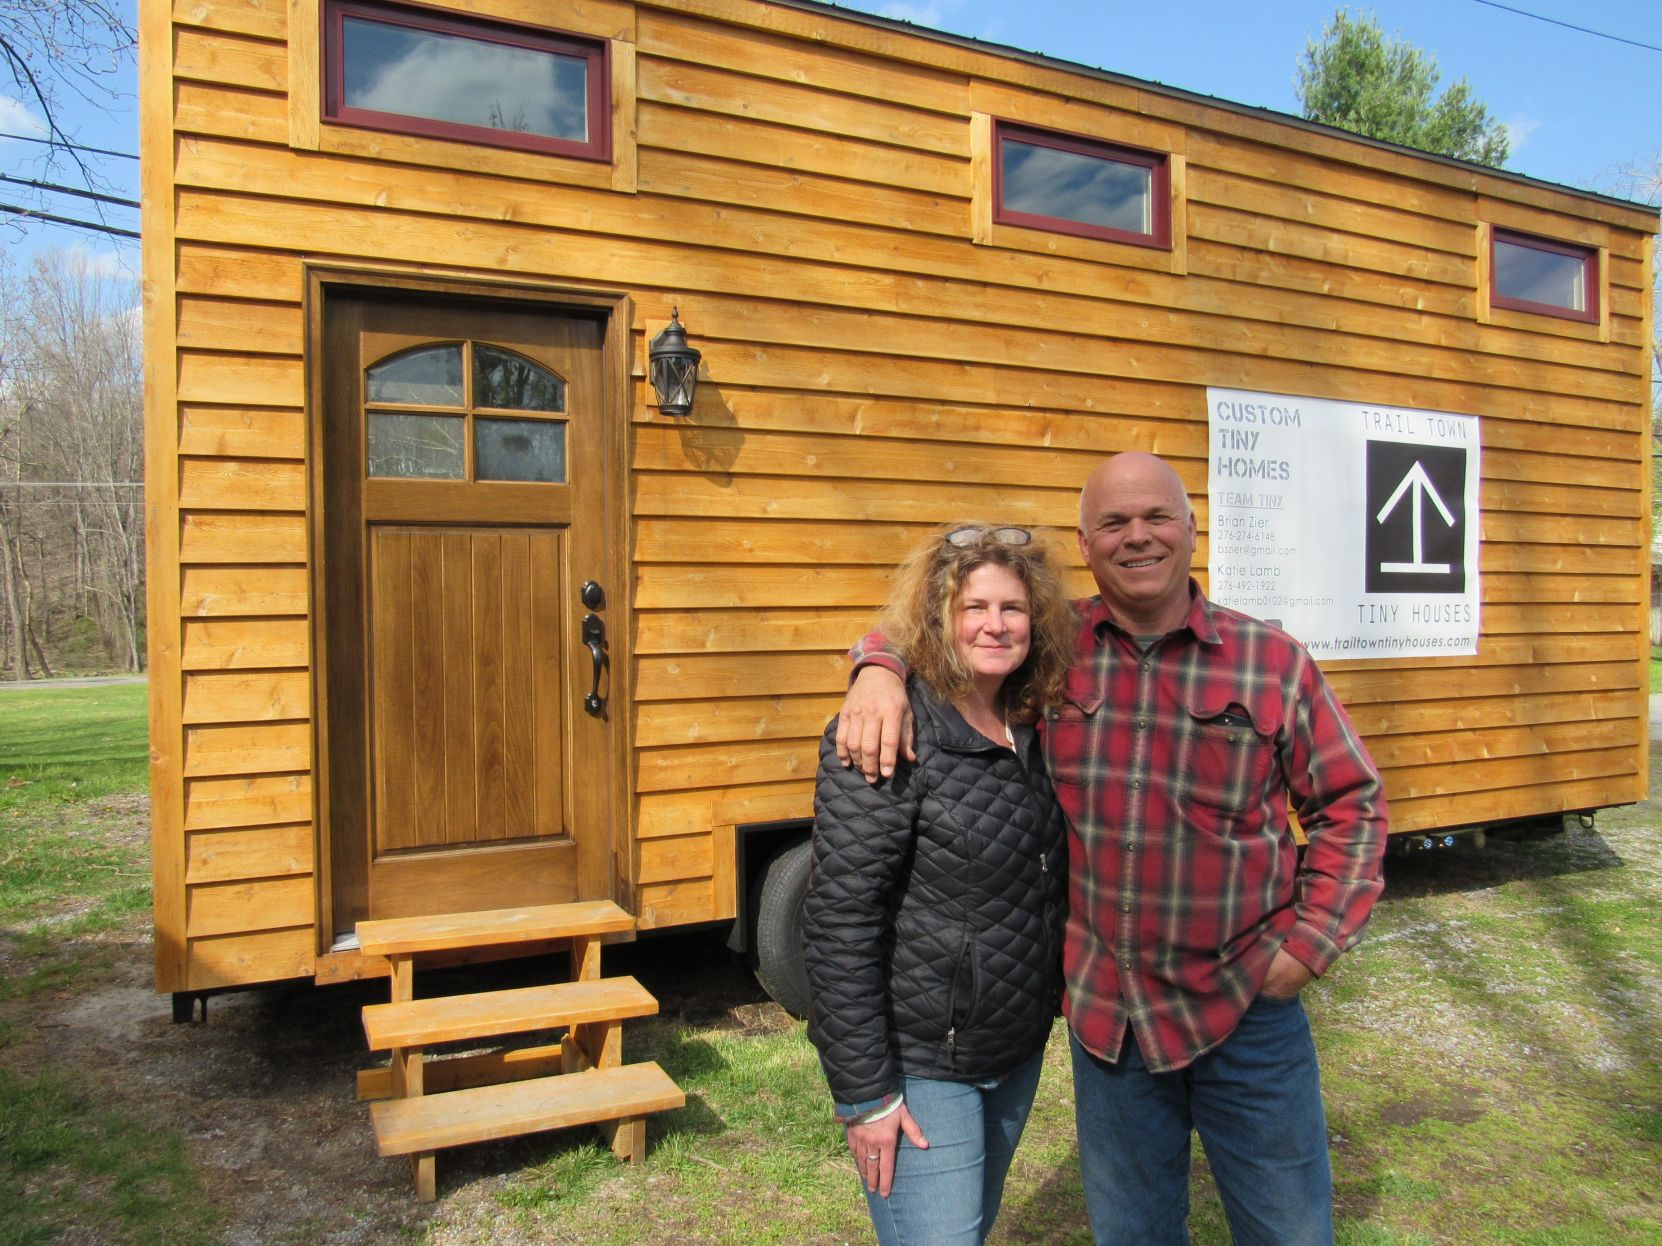 big dreams damascus couple joins tiny house movement news rh heraldcourier com